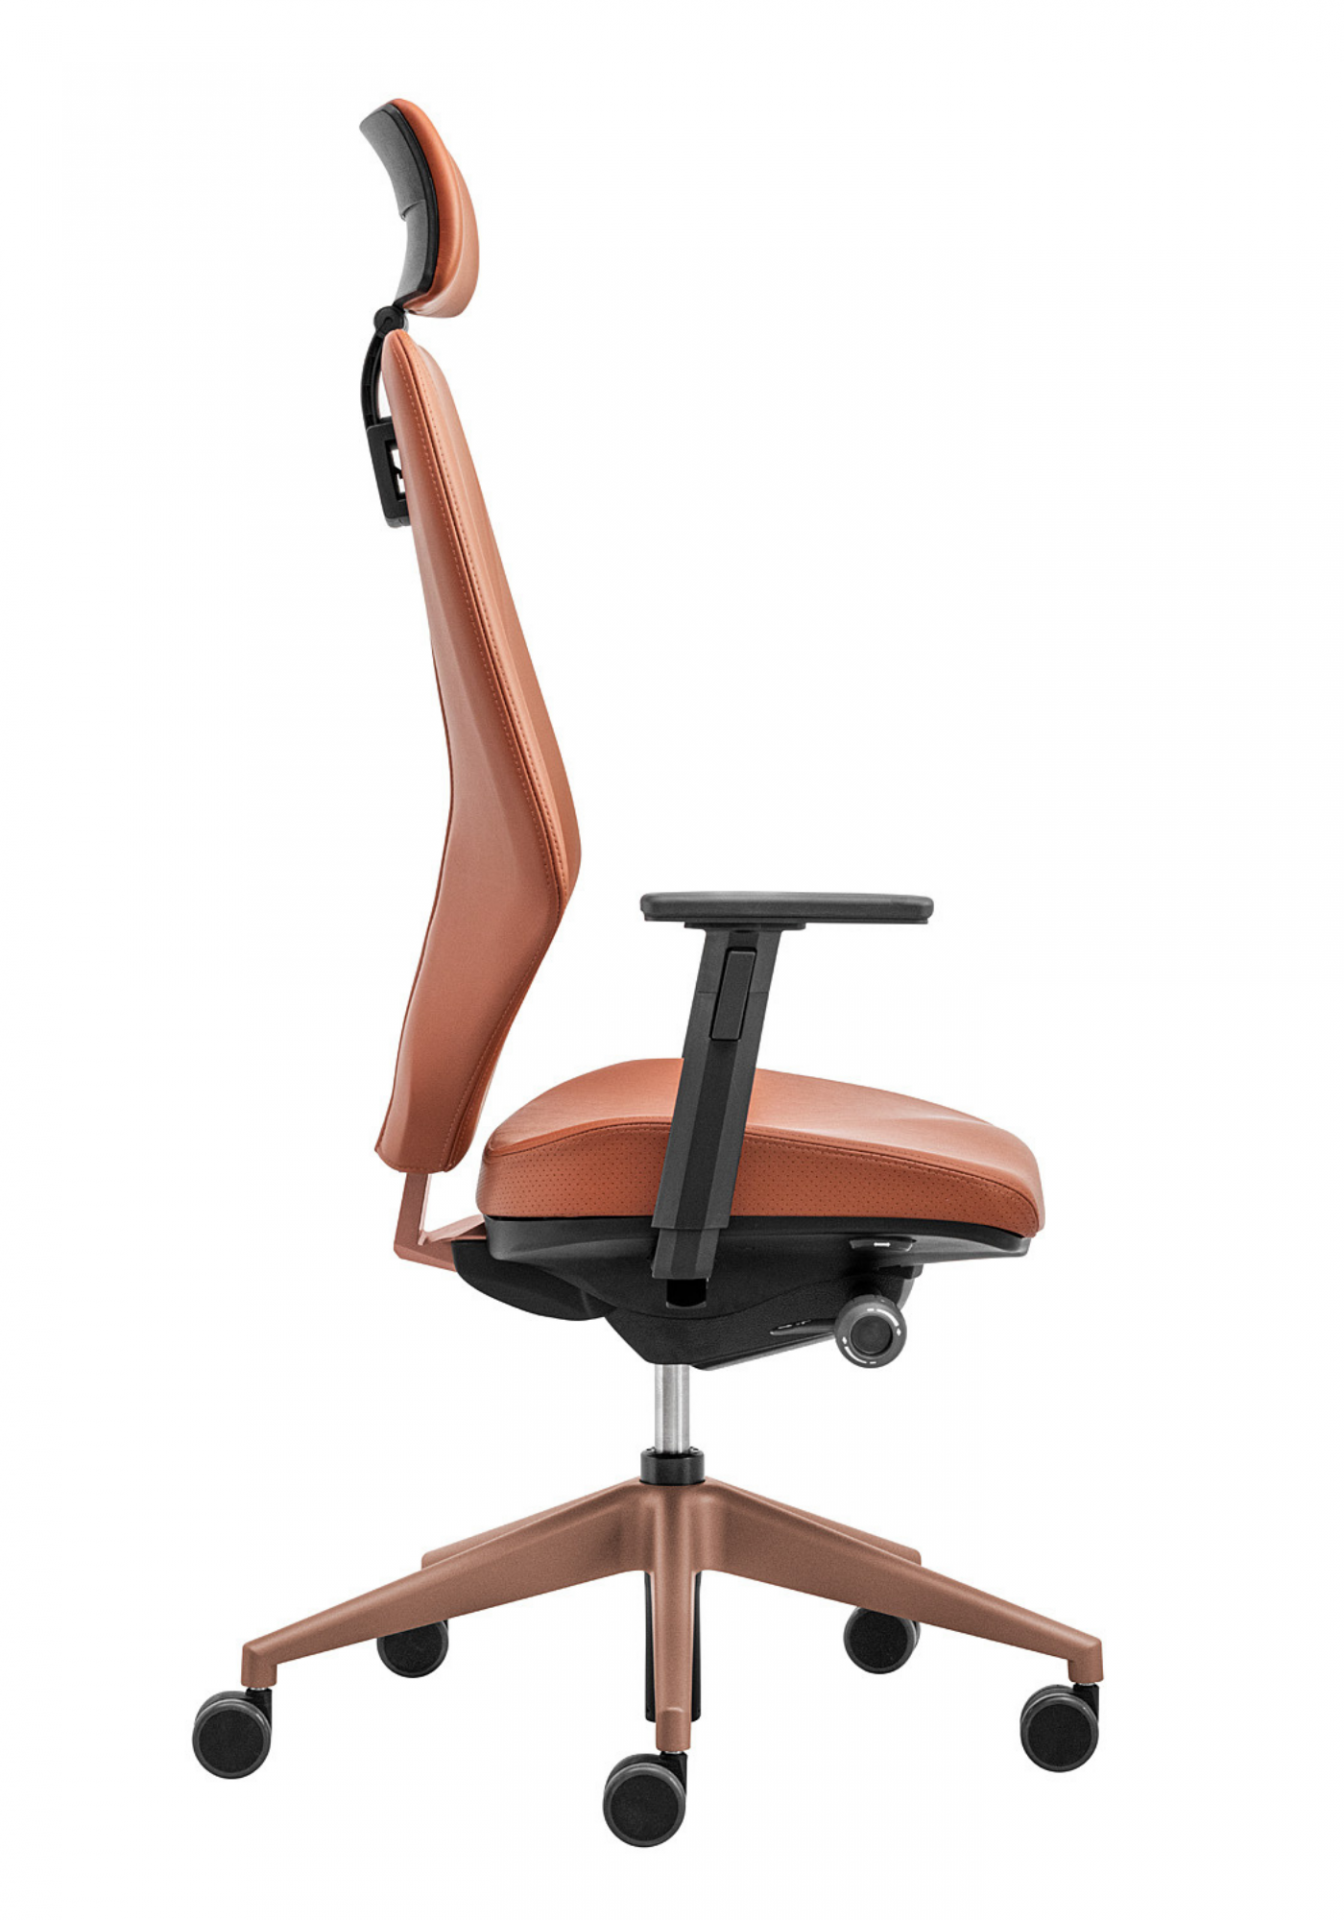 VANK_V6_swivel_chair_designalive10